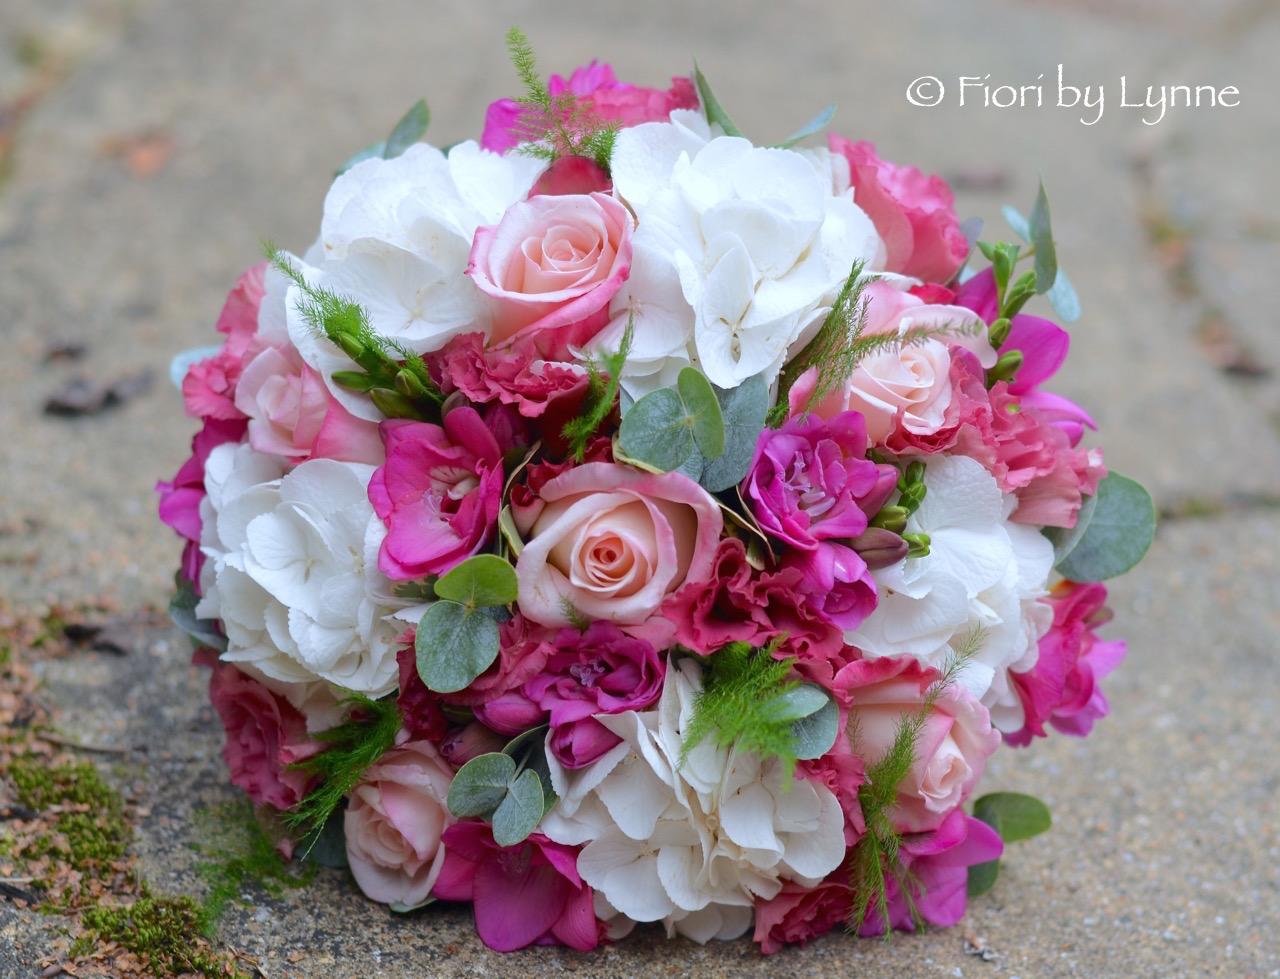 Gemmas Wedding Flowers Tithe Barn Petersfield Hampshire